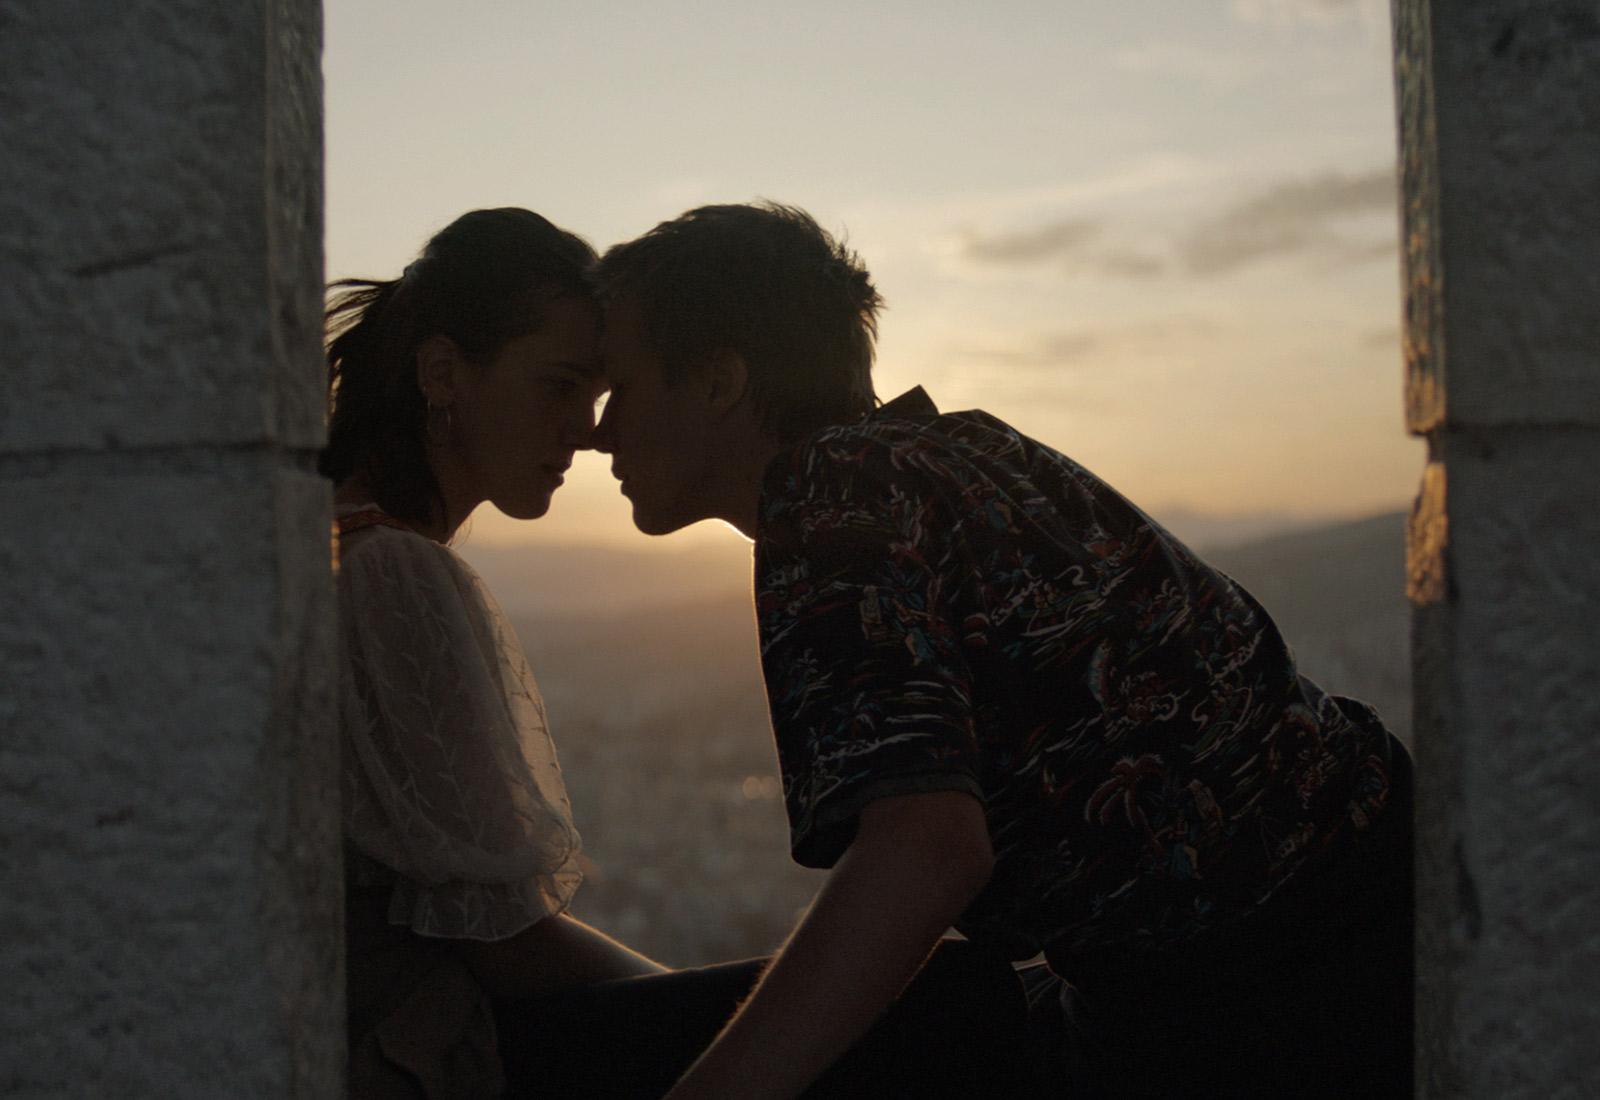 https://theatrefilm.ubc.ca/wp-content/uploads/sites/21/2021/02/photo_WhiteFortress-Tabija-STILL-3.jpg